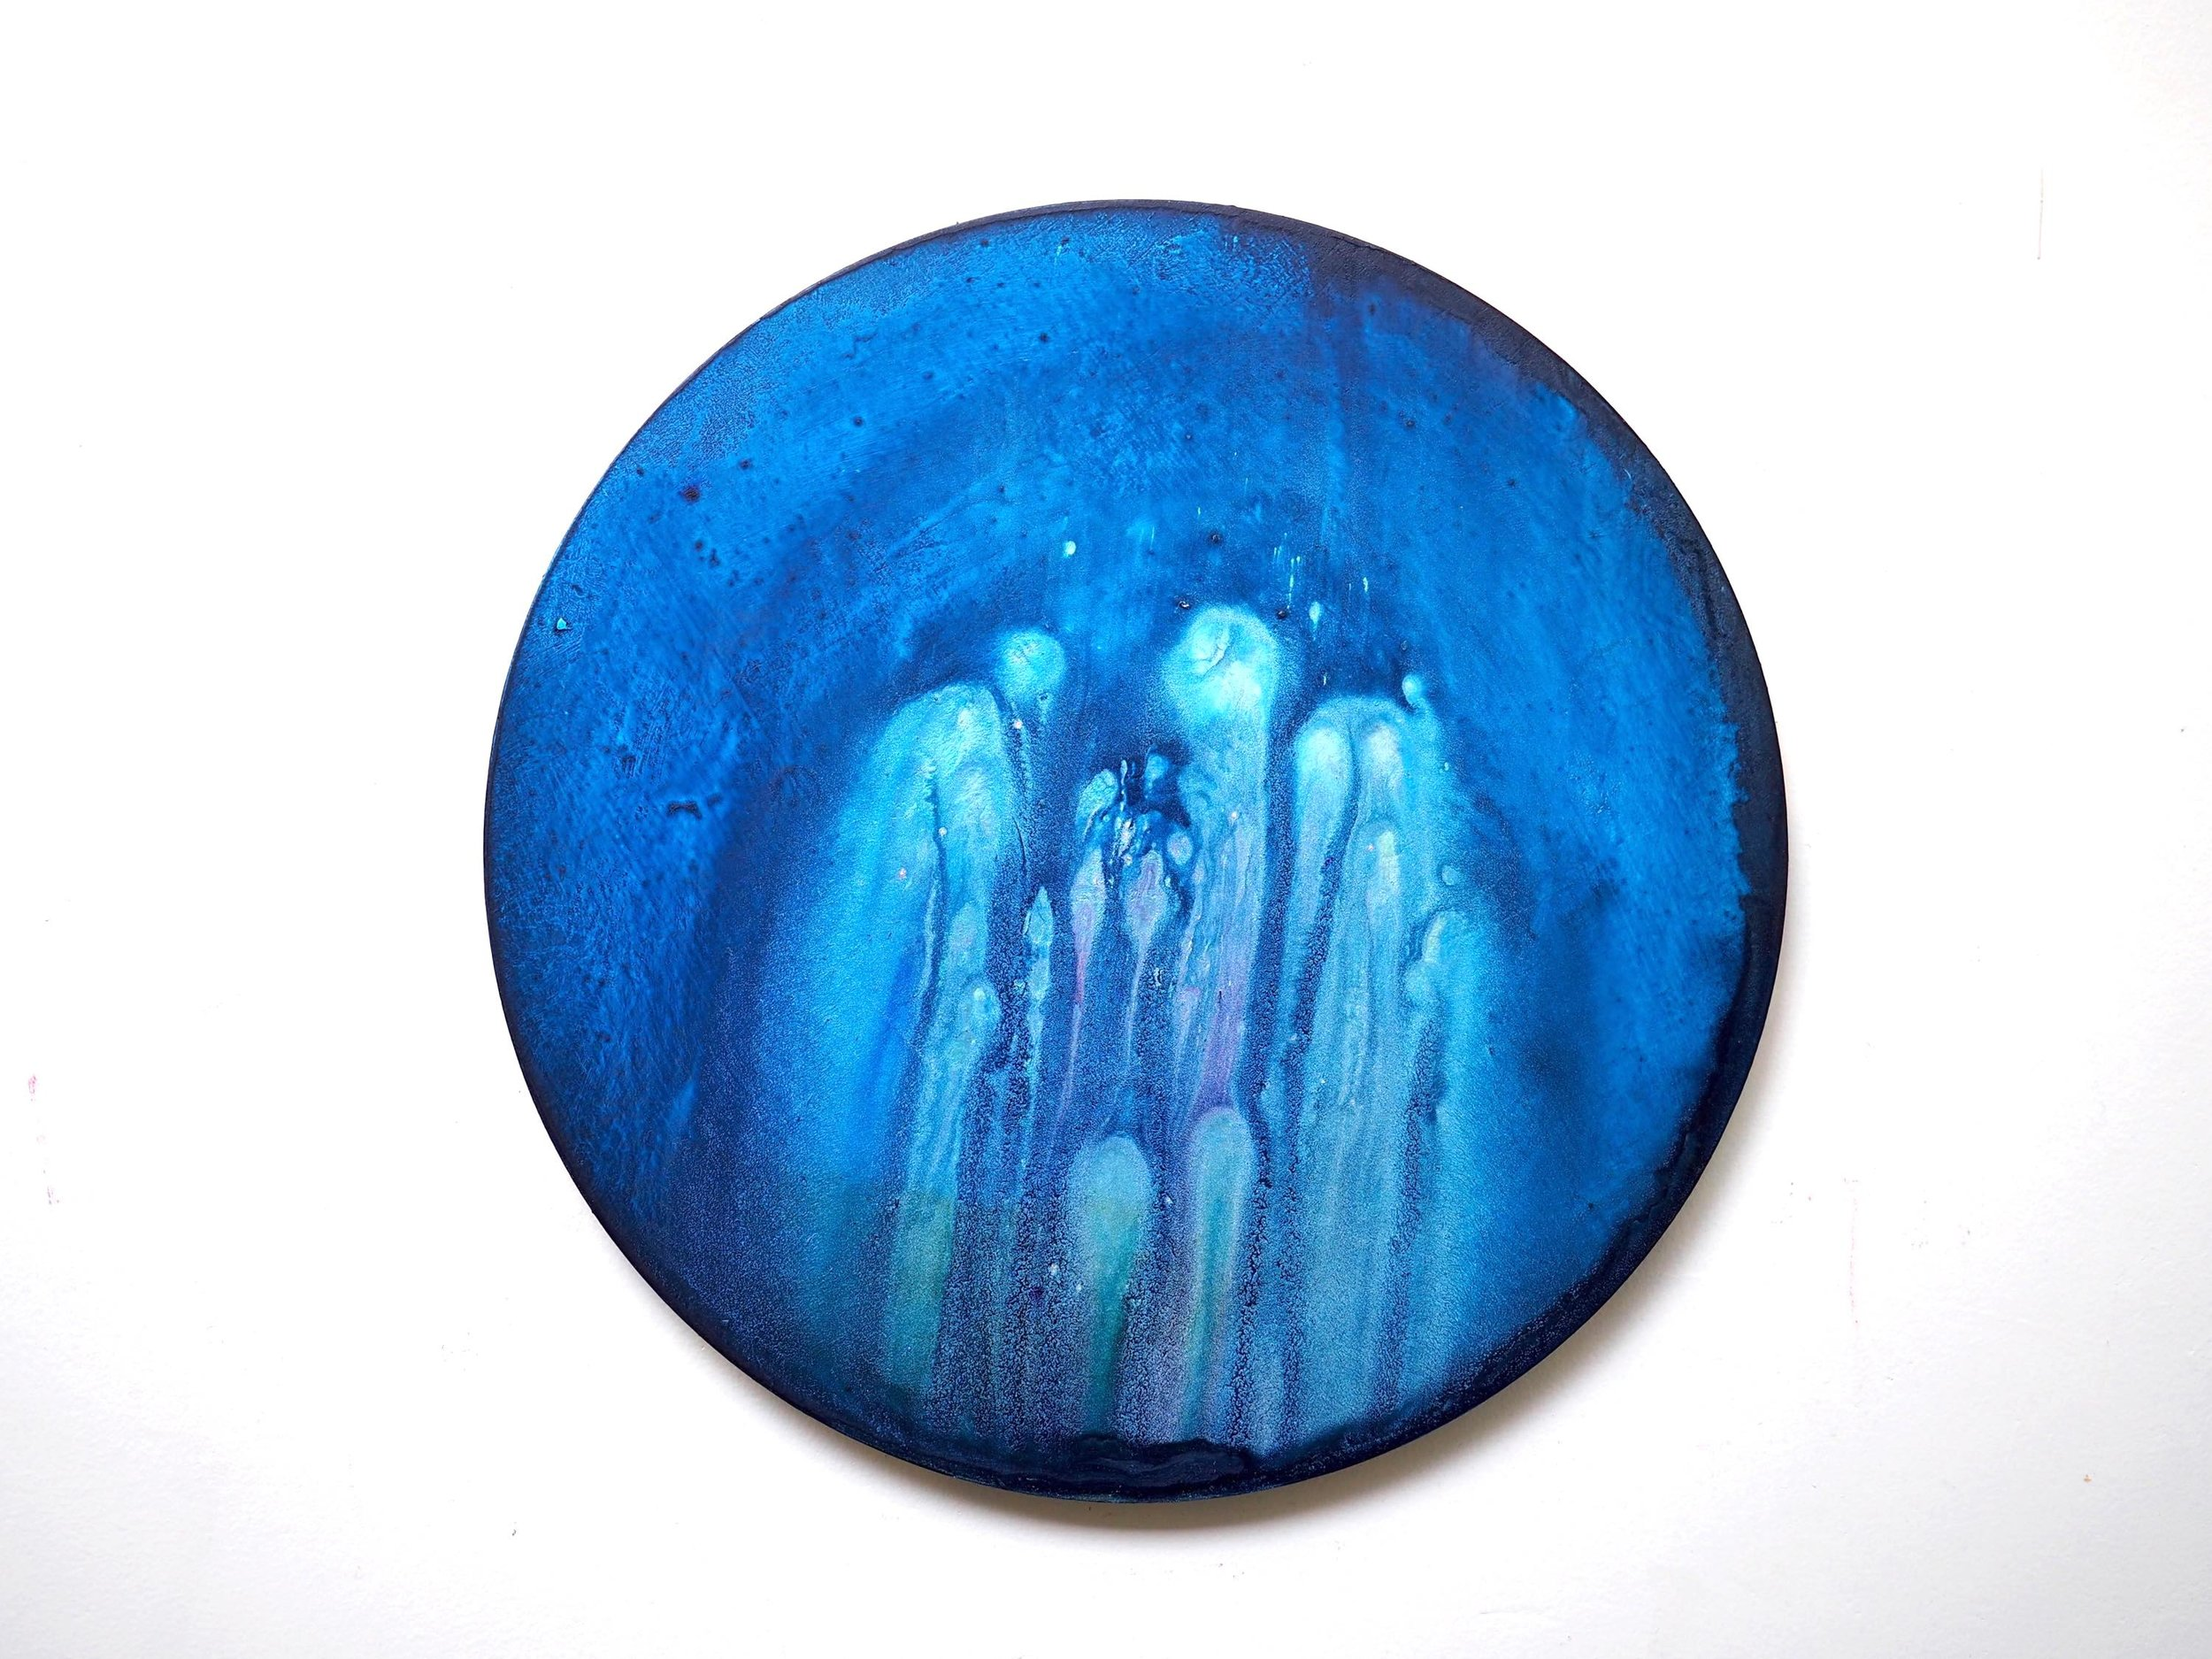 2016  Acrylic ,mineral pigment powder and metallic powder on board  41cm diameter